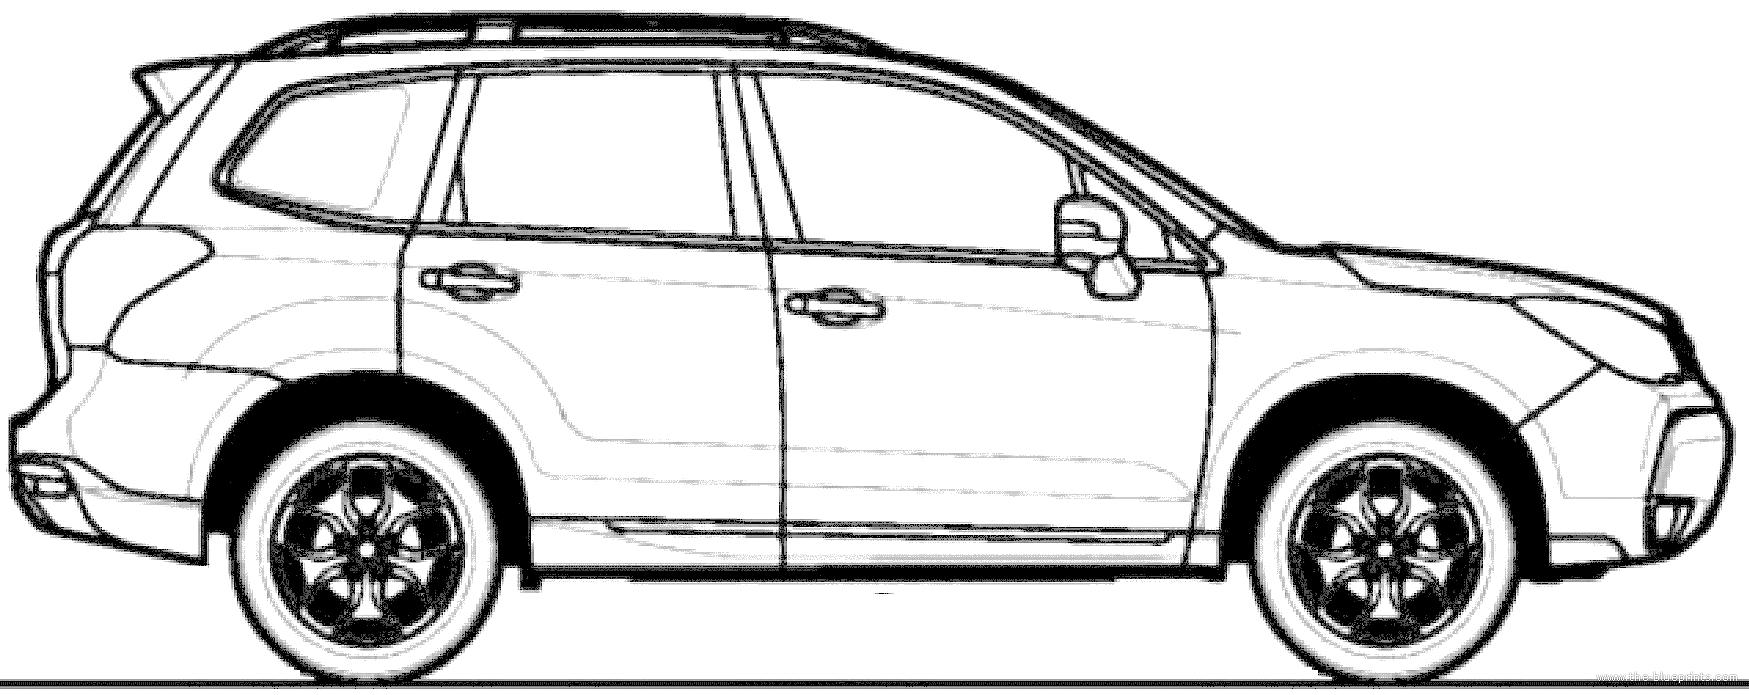 blueprints  u0026gt  cars  u0026gt  subaru  u0026gt  subaru forester  2013